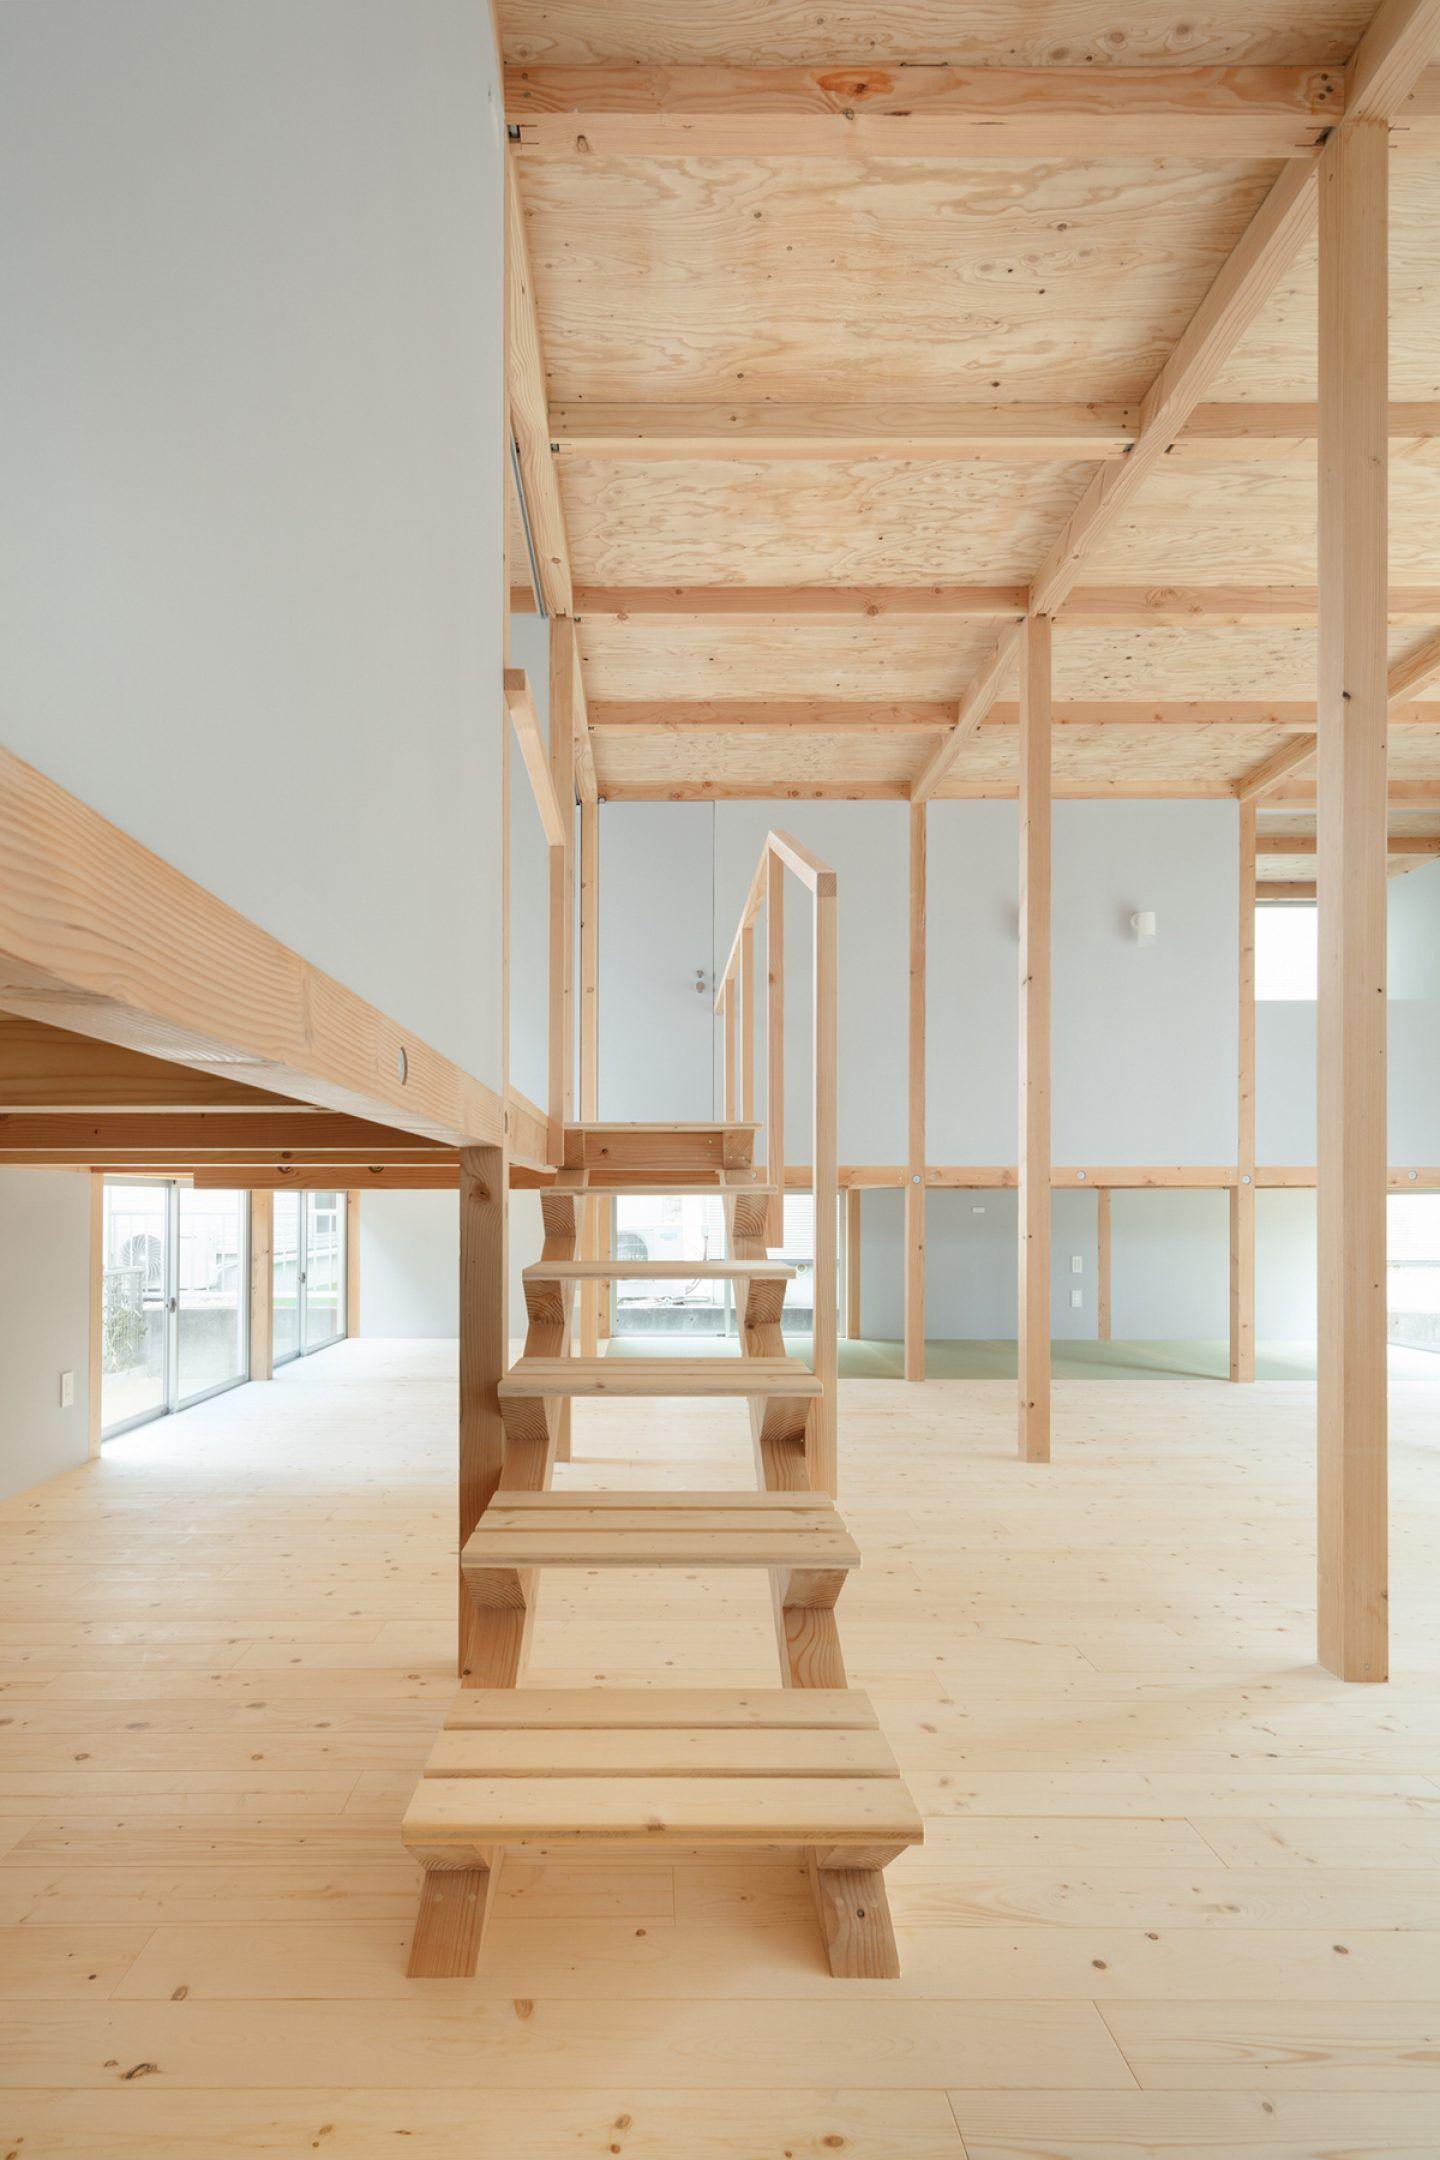 IGNANT-Architecture-Naoya-Kitamura-Koda-Townhouse-11